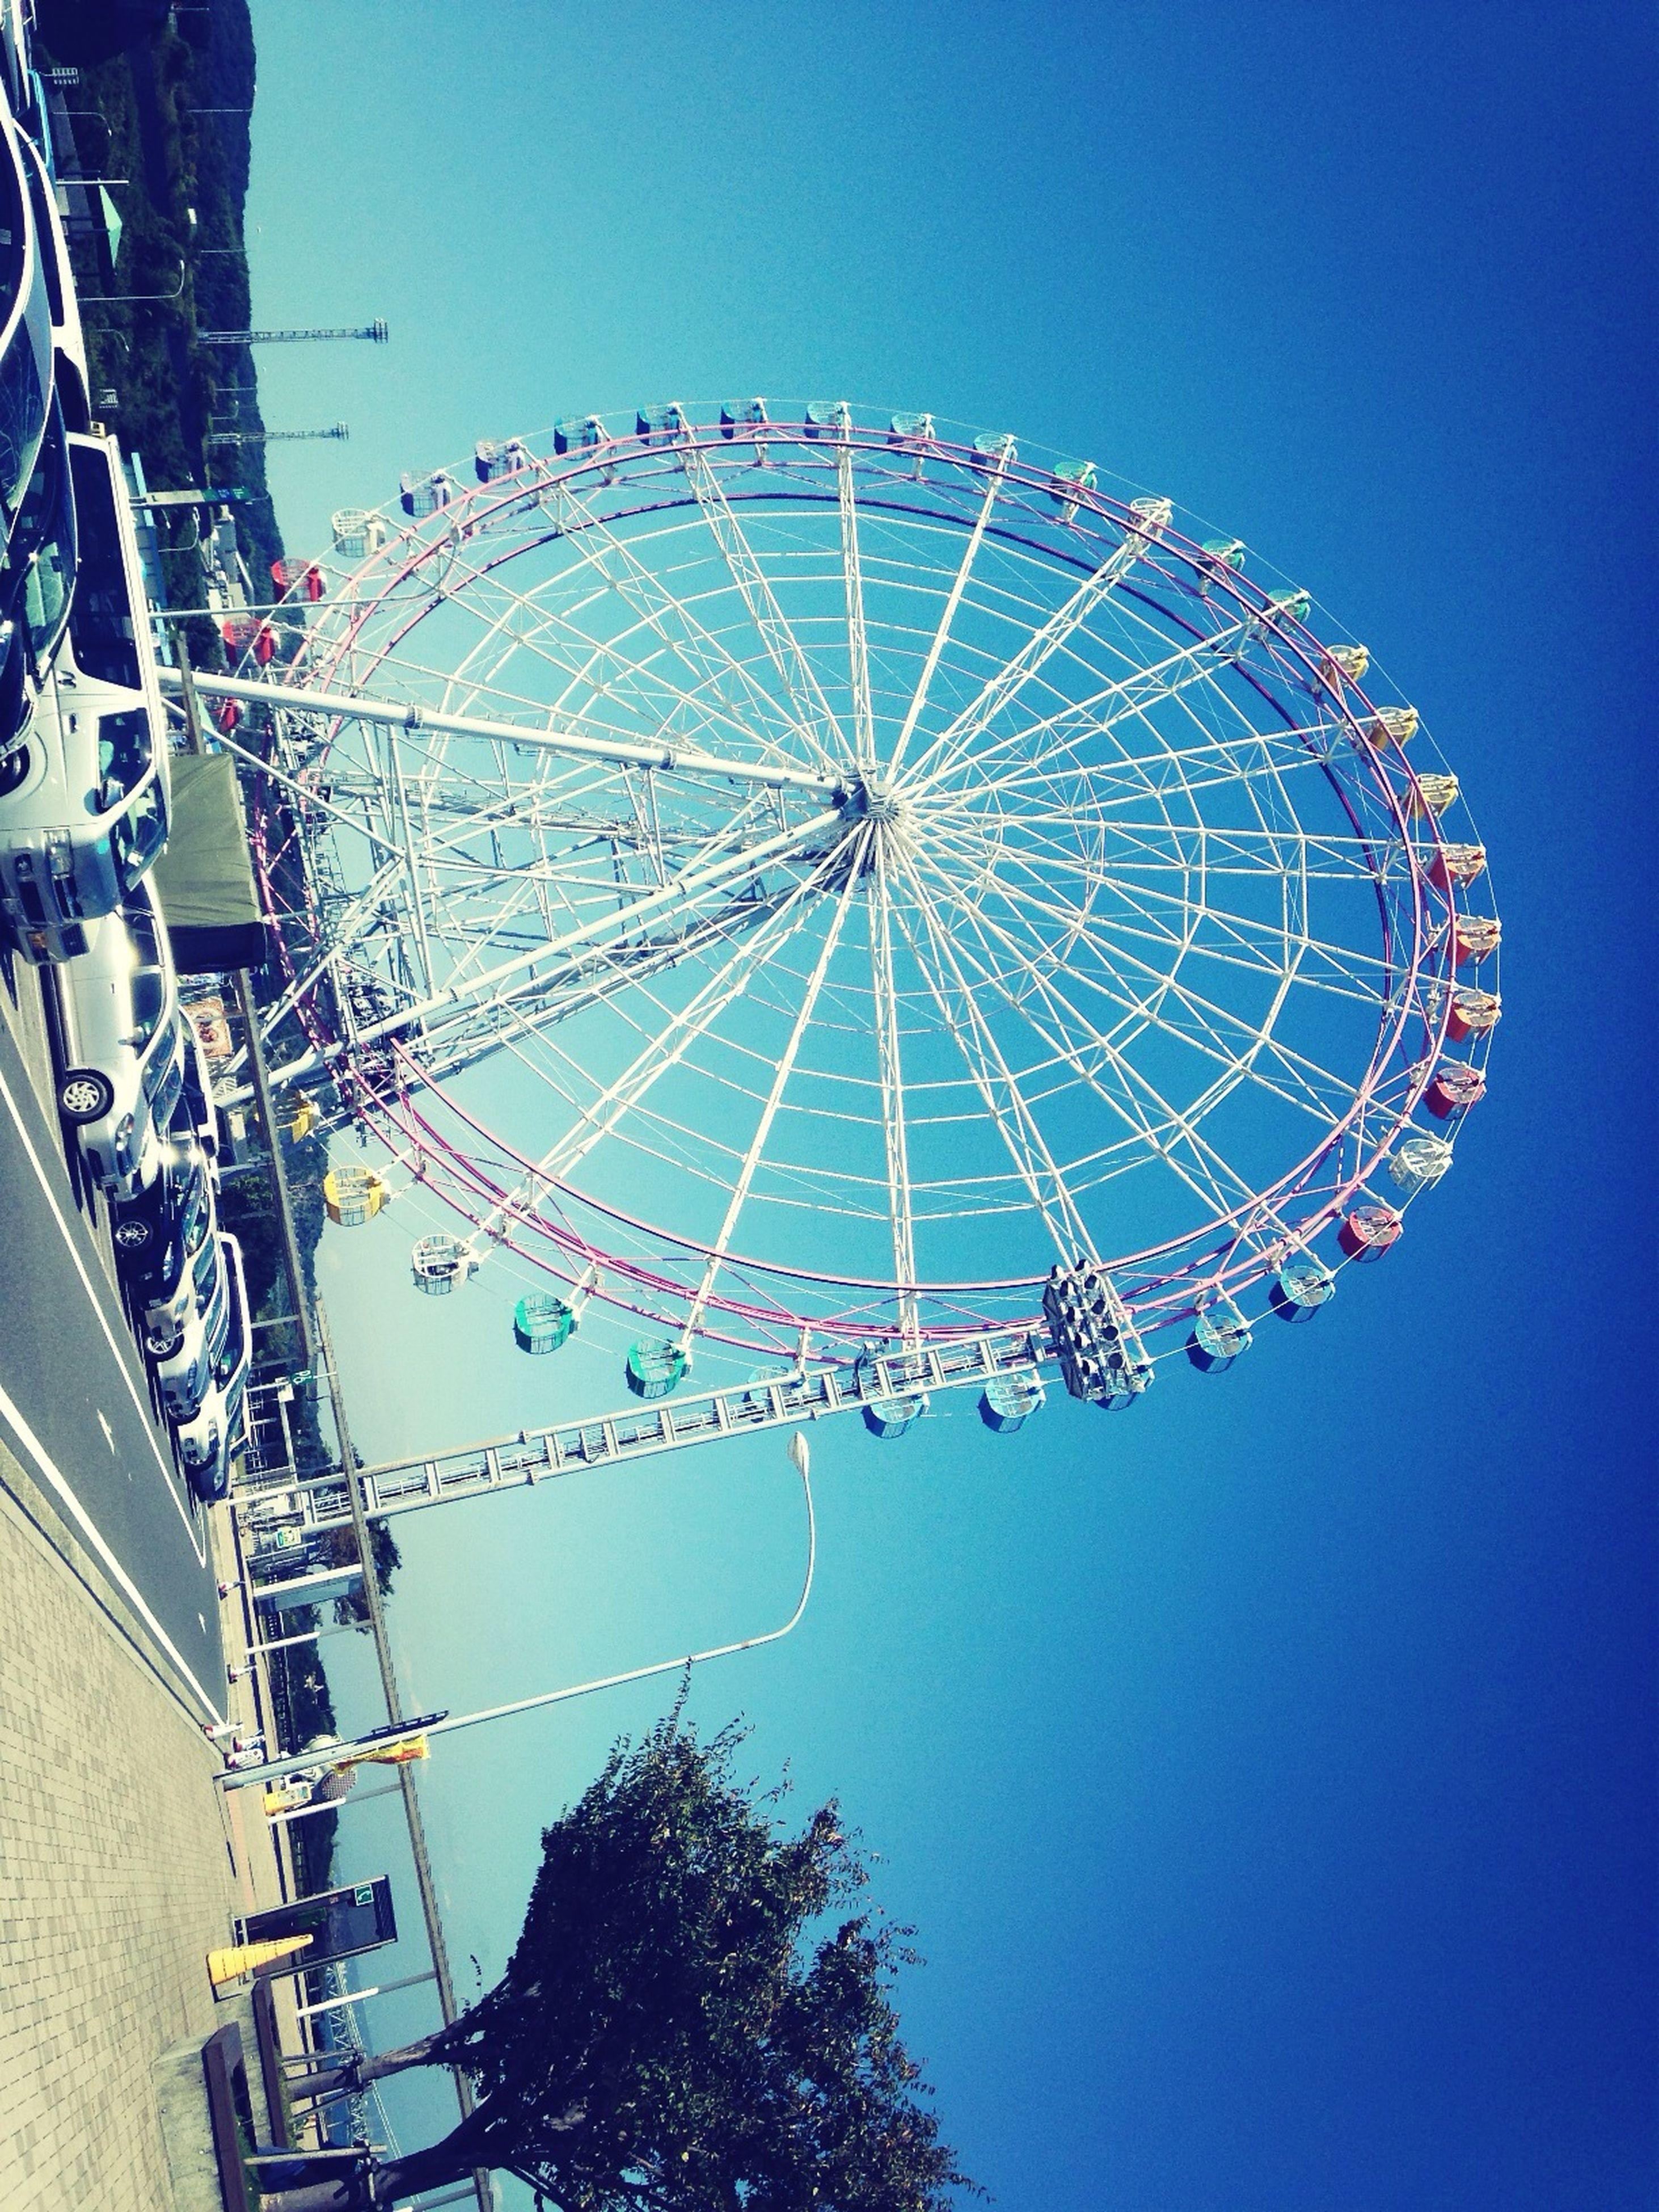 ferris wheel, amusement park, amusement park ride, arts culture and entertainment, low angle view, clear sky, blue, built structure, architecture, sky, fun, building exterior, copy space, outdoors, enjoyment, circle, big wheel, incidental people, large, day